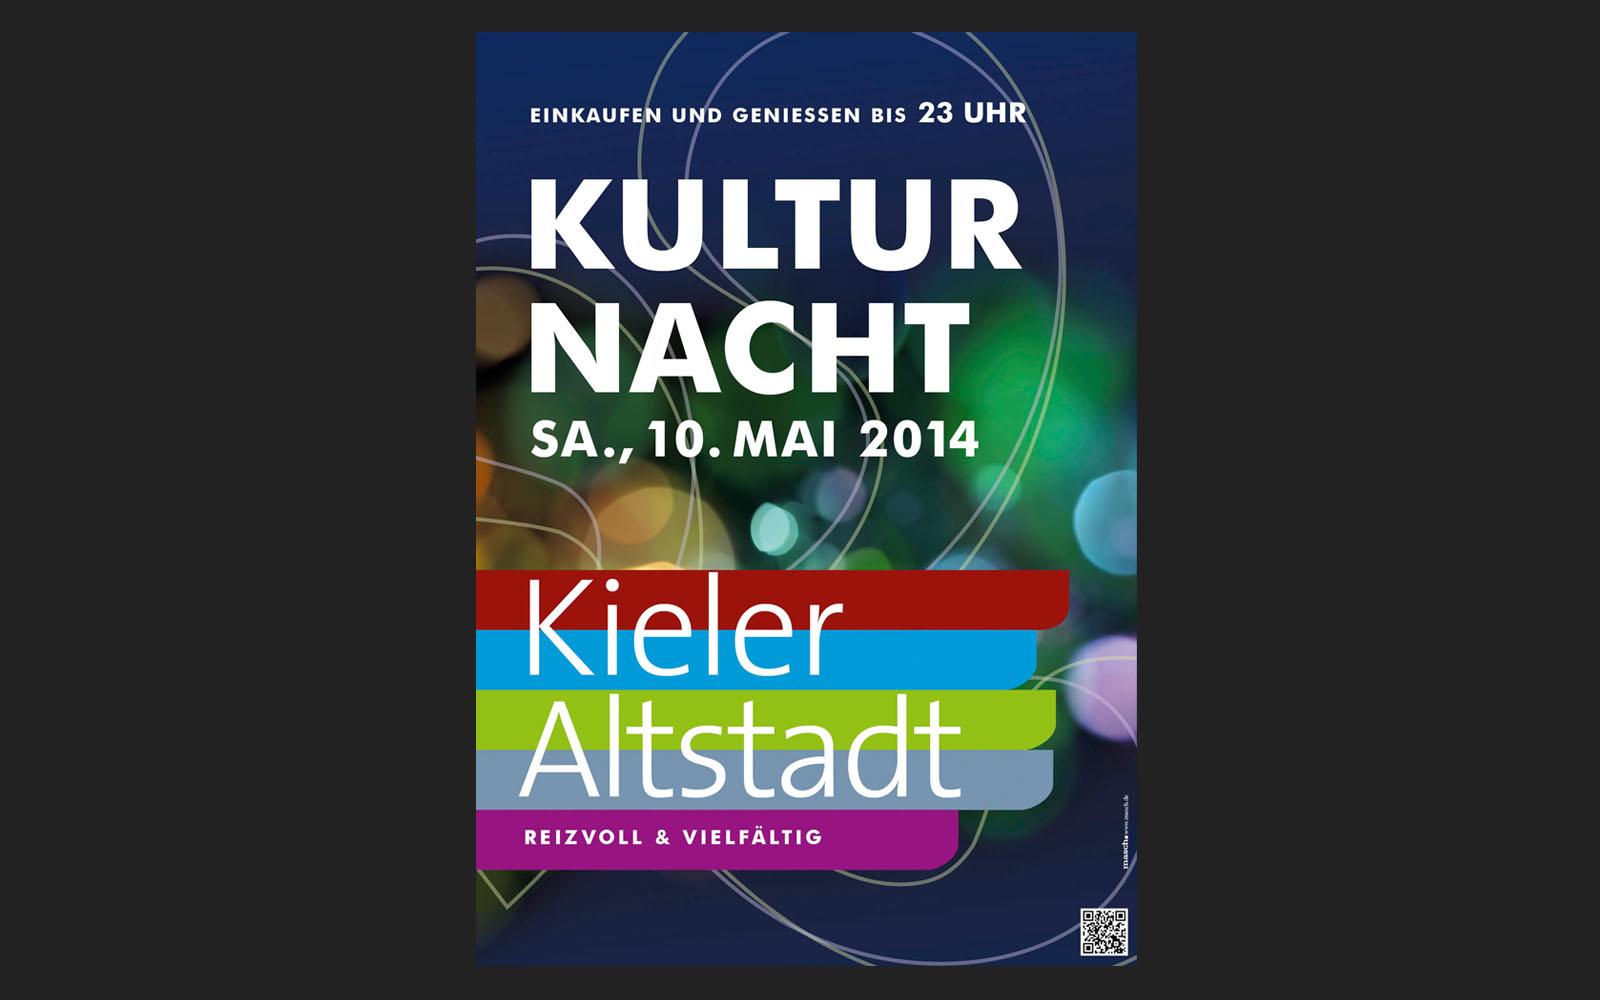 kulturnacht14 02.jpg